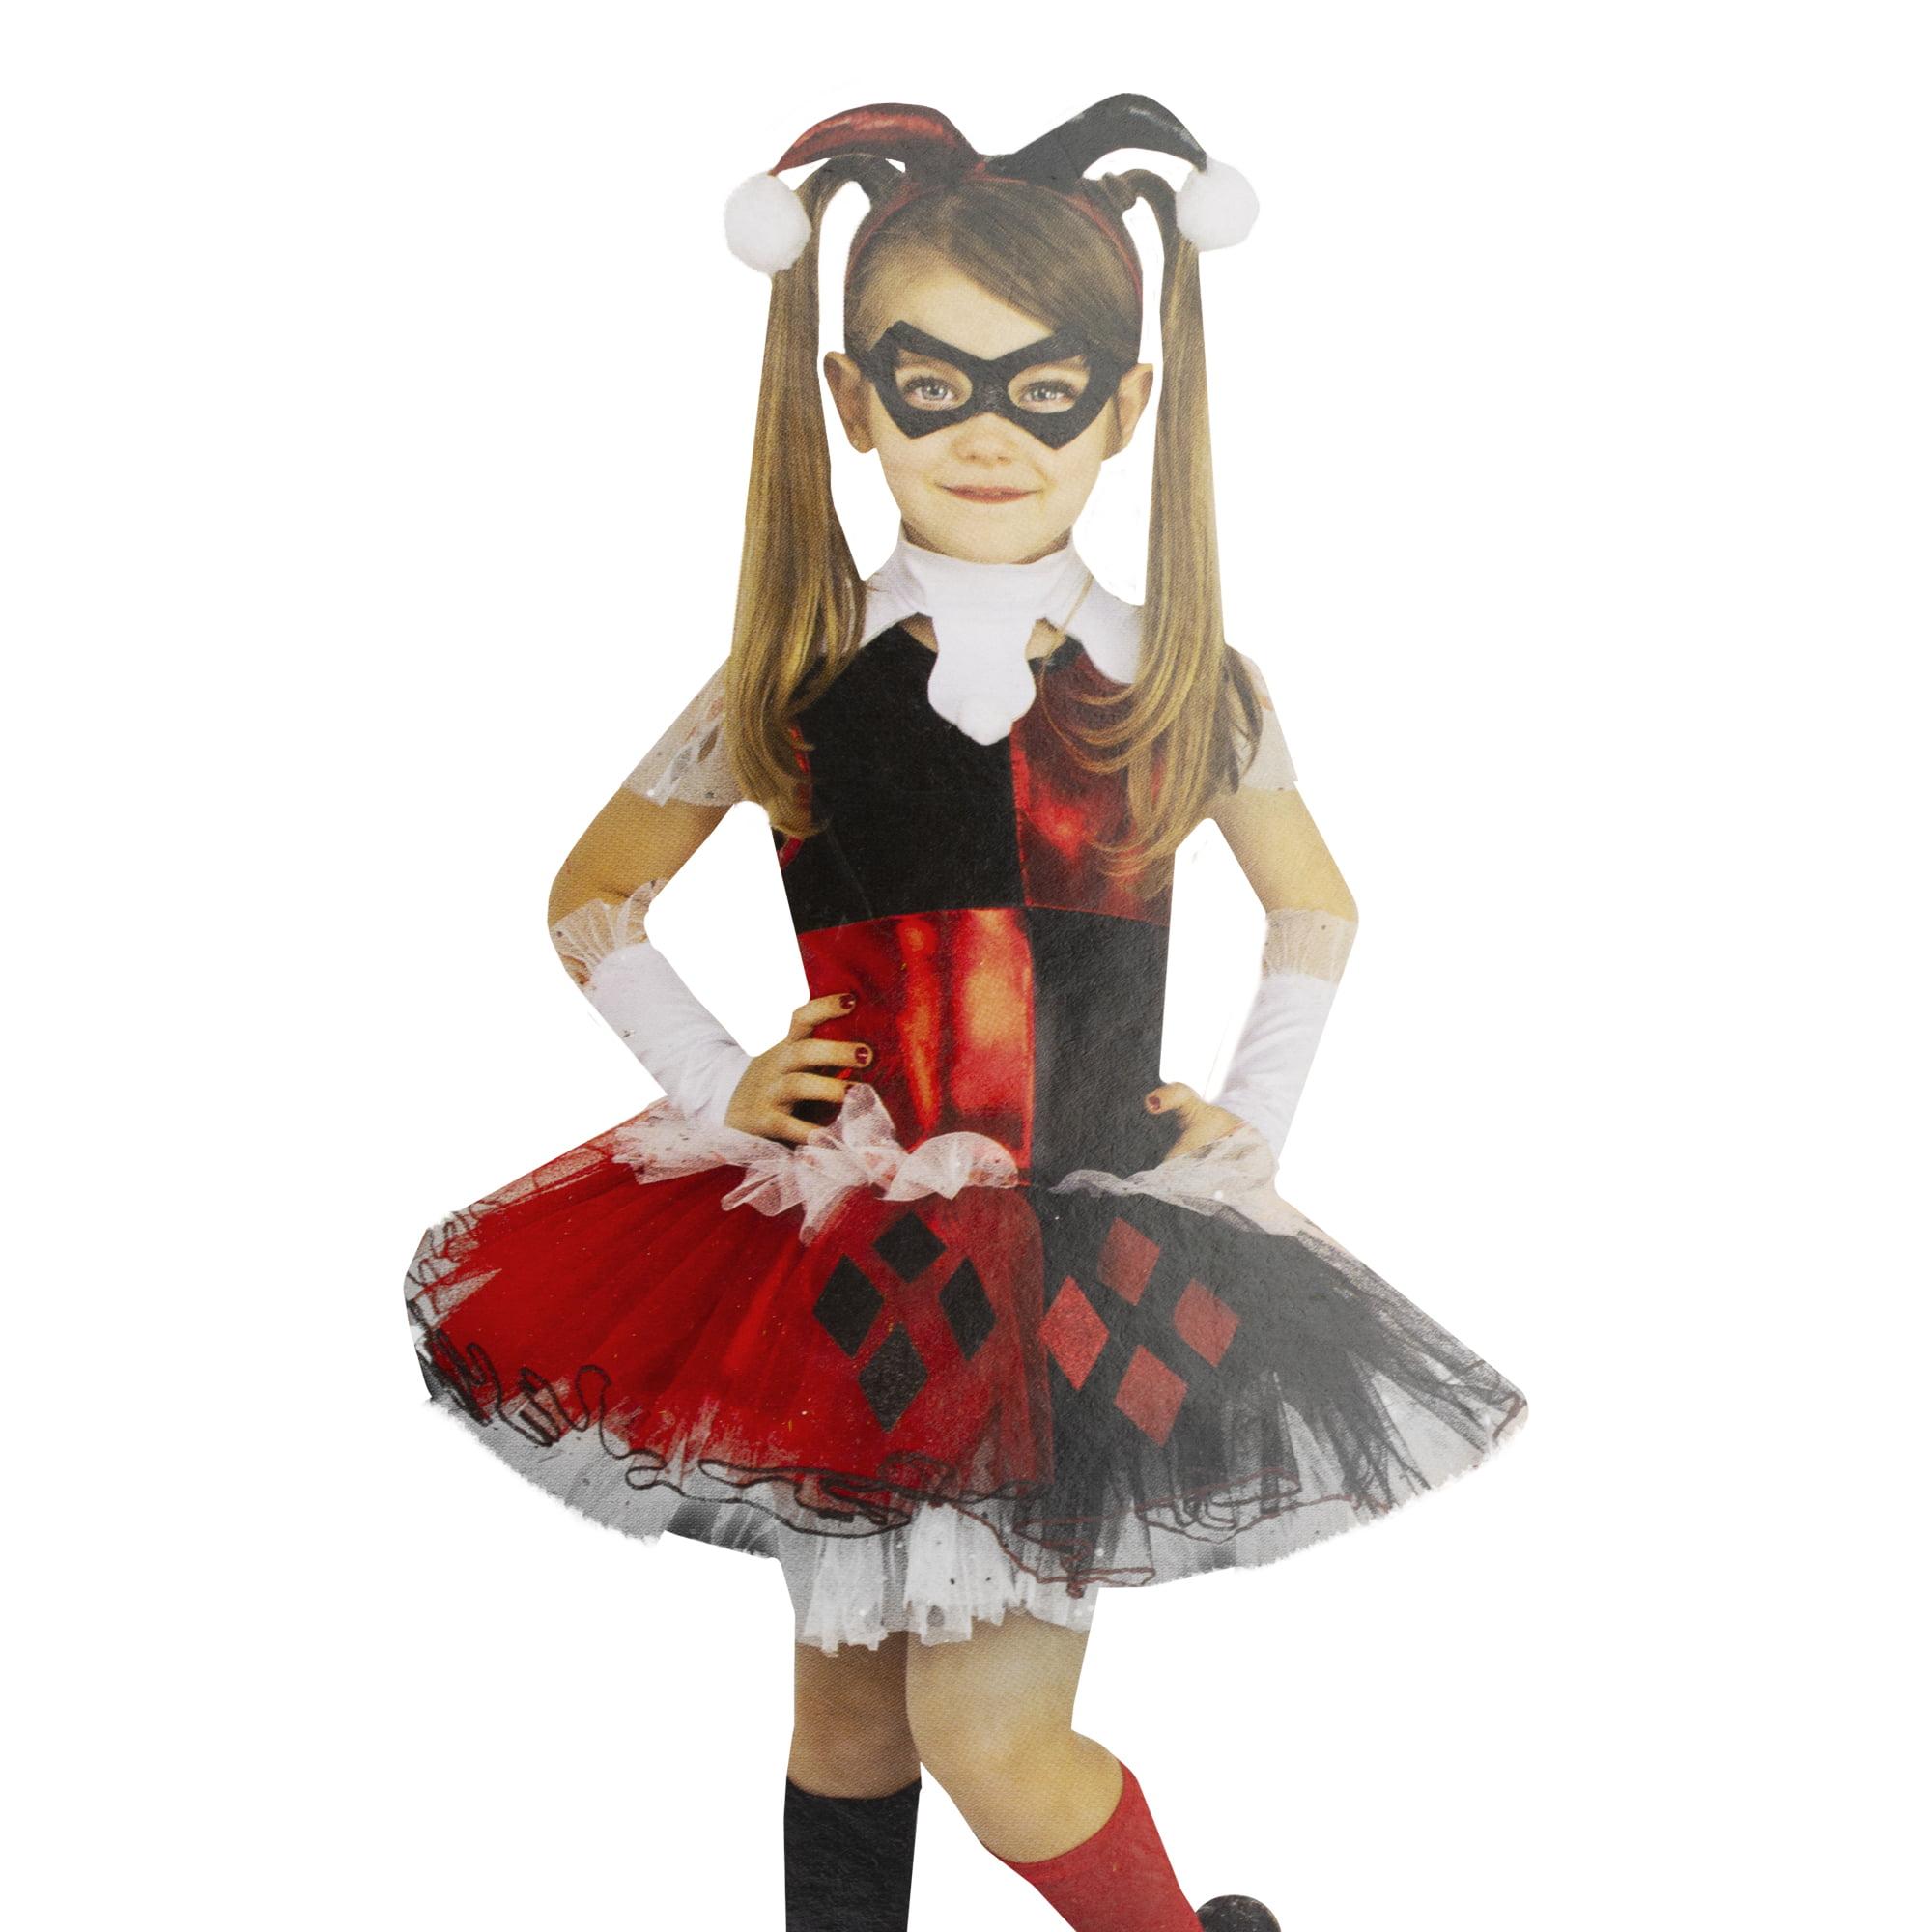 Size 12 Girls Halloween Costumes.Harley Quinn Girls Halloween Costume Size Large 12 14 Ages 8 10 Walmart Com Walmart Com